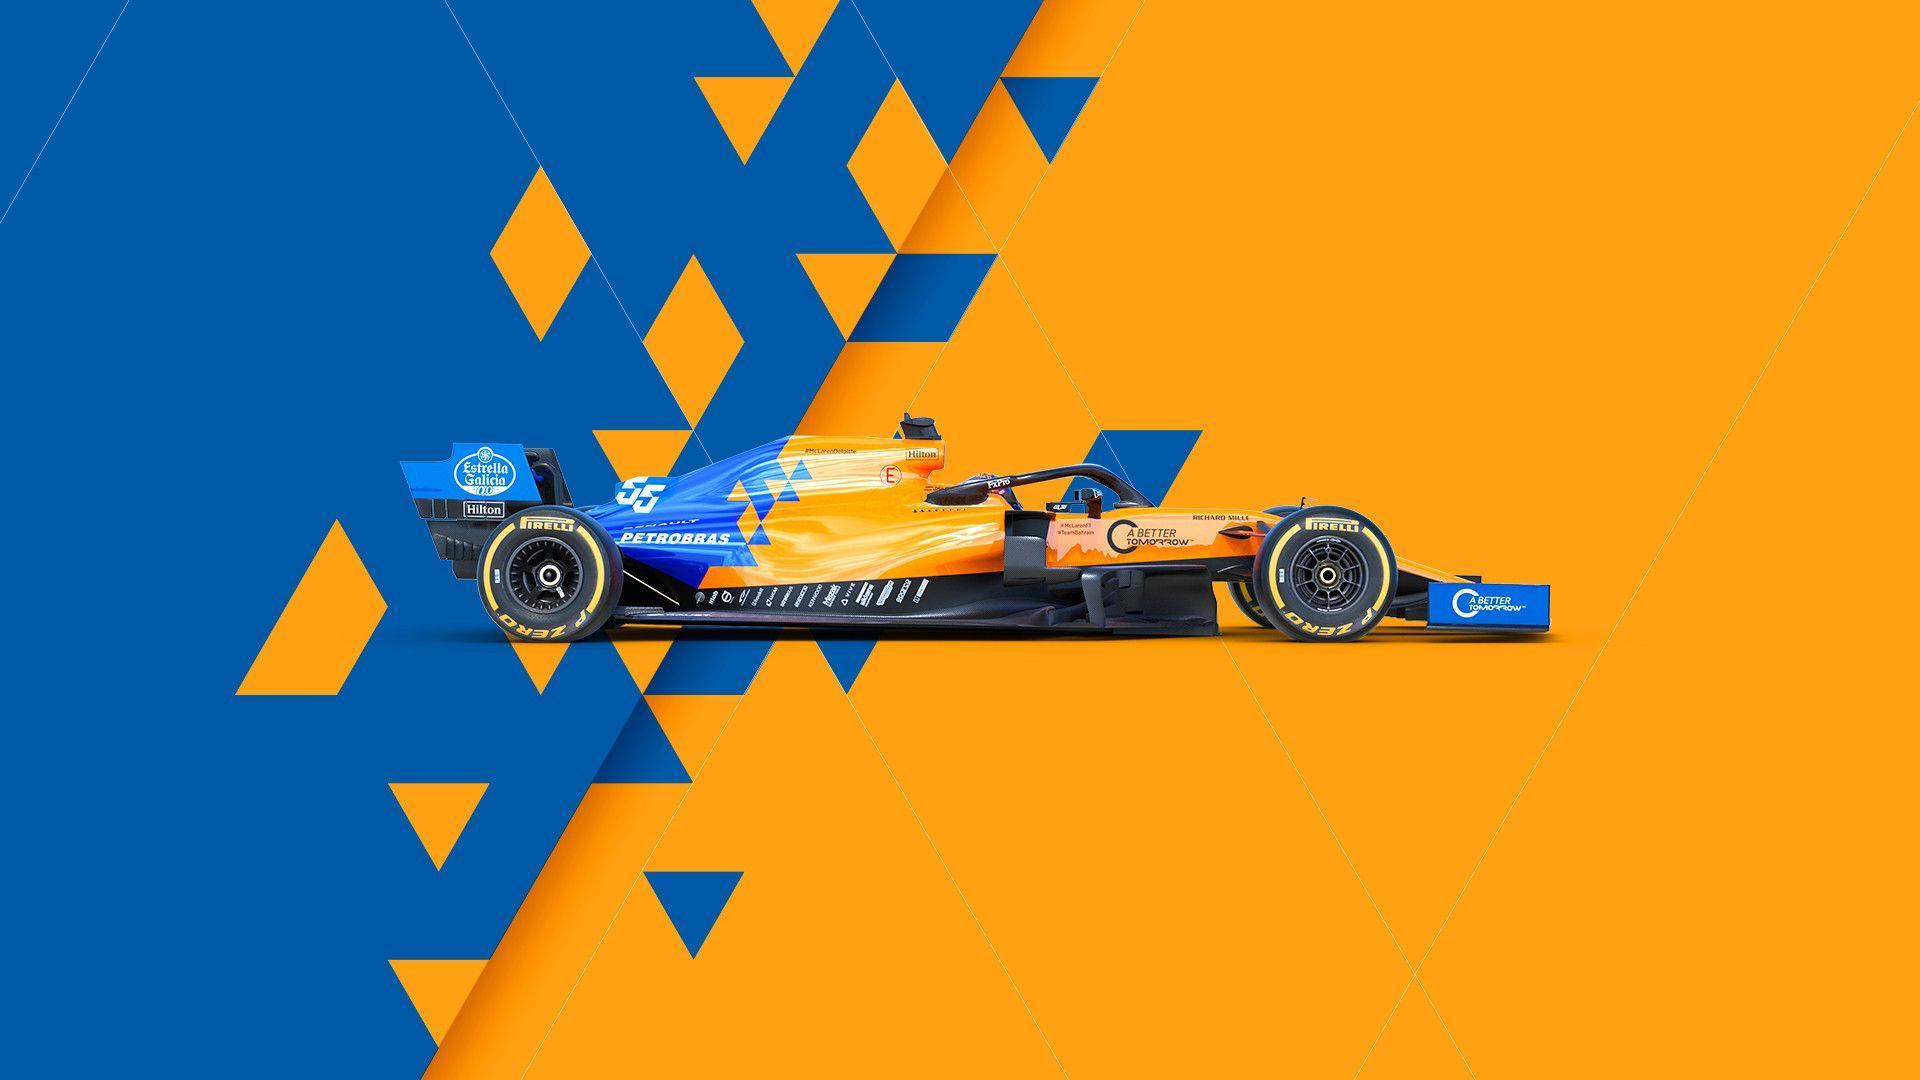 Mclaren Formula 1 Wallpapers Top Free Mclaren Formula 1 Backgrounds Wallpaperaccess